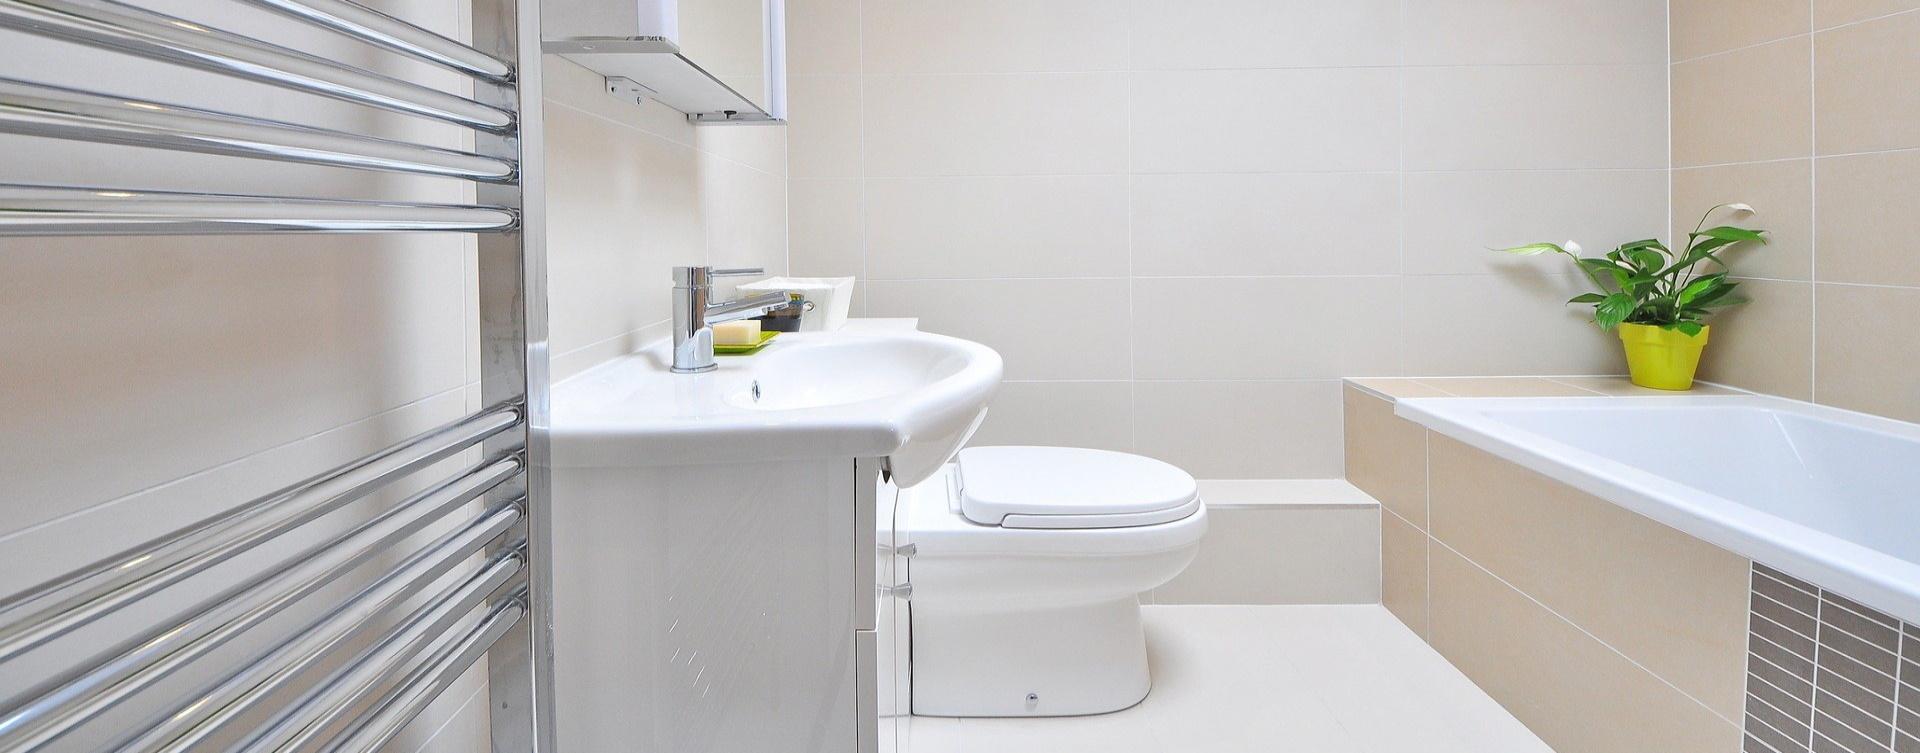 Bathroom Installation South East London | Renovation ...